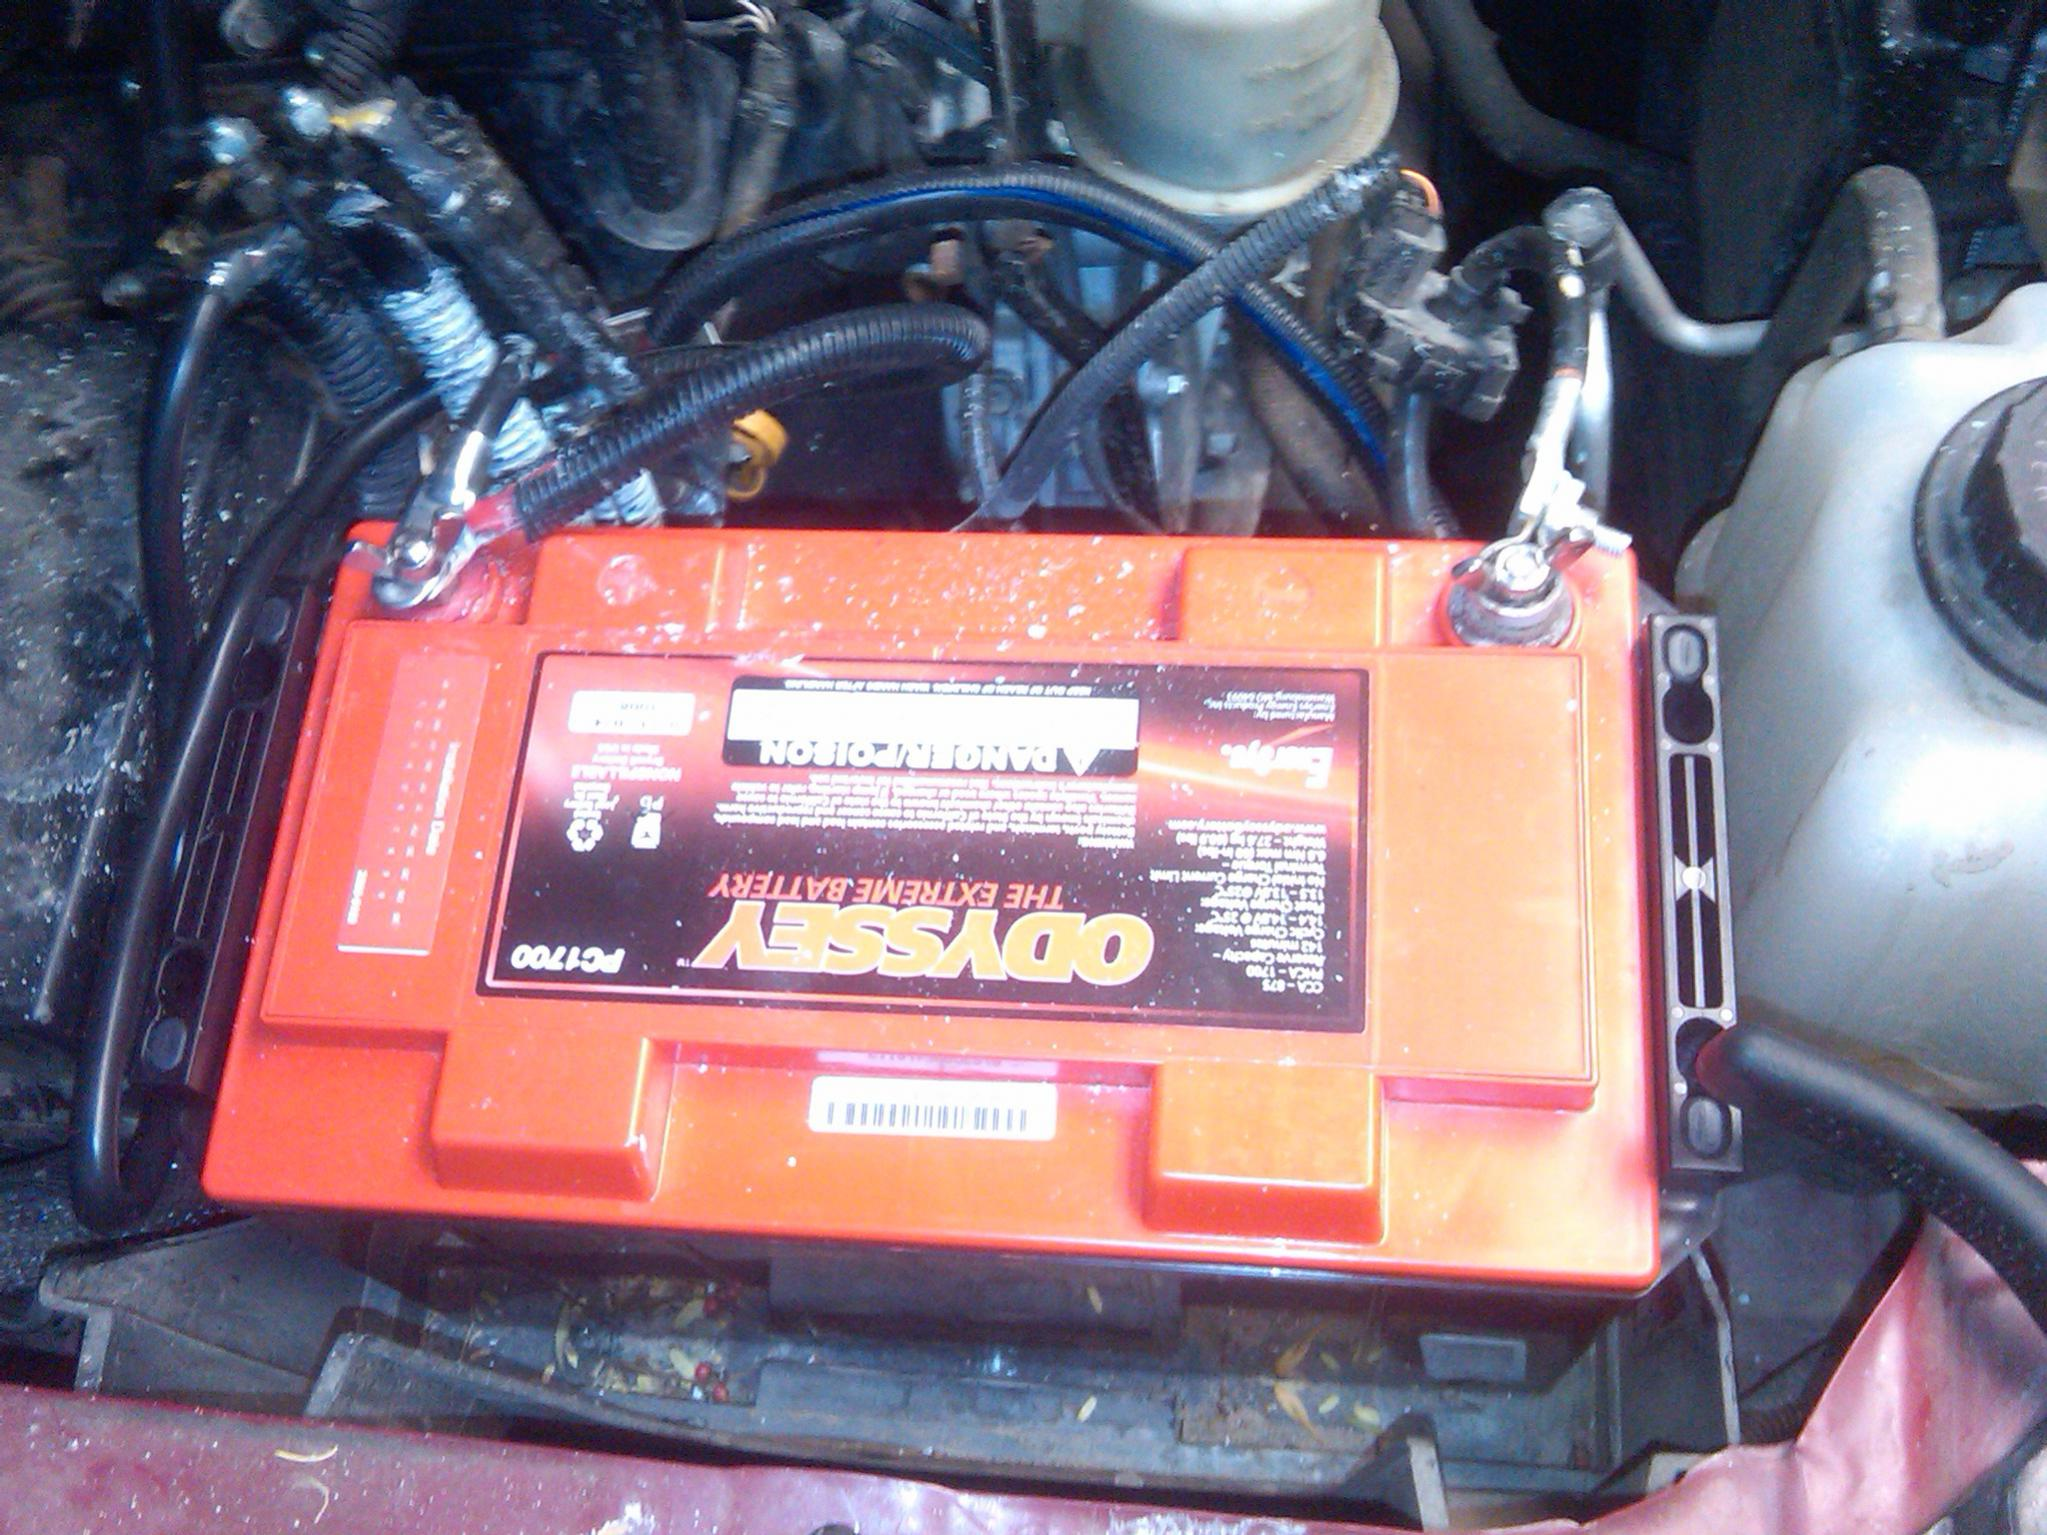 odyssey batteries-img00109-20100211-1602.jpg